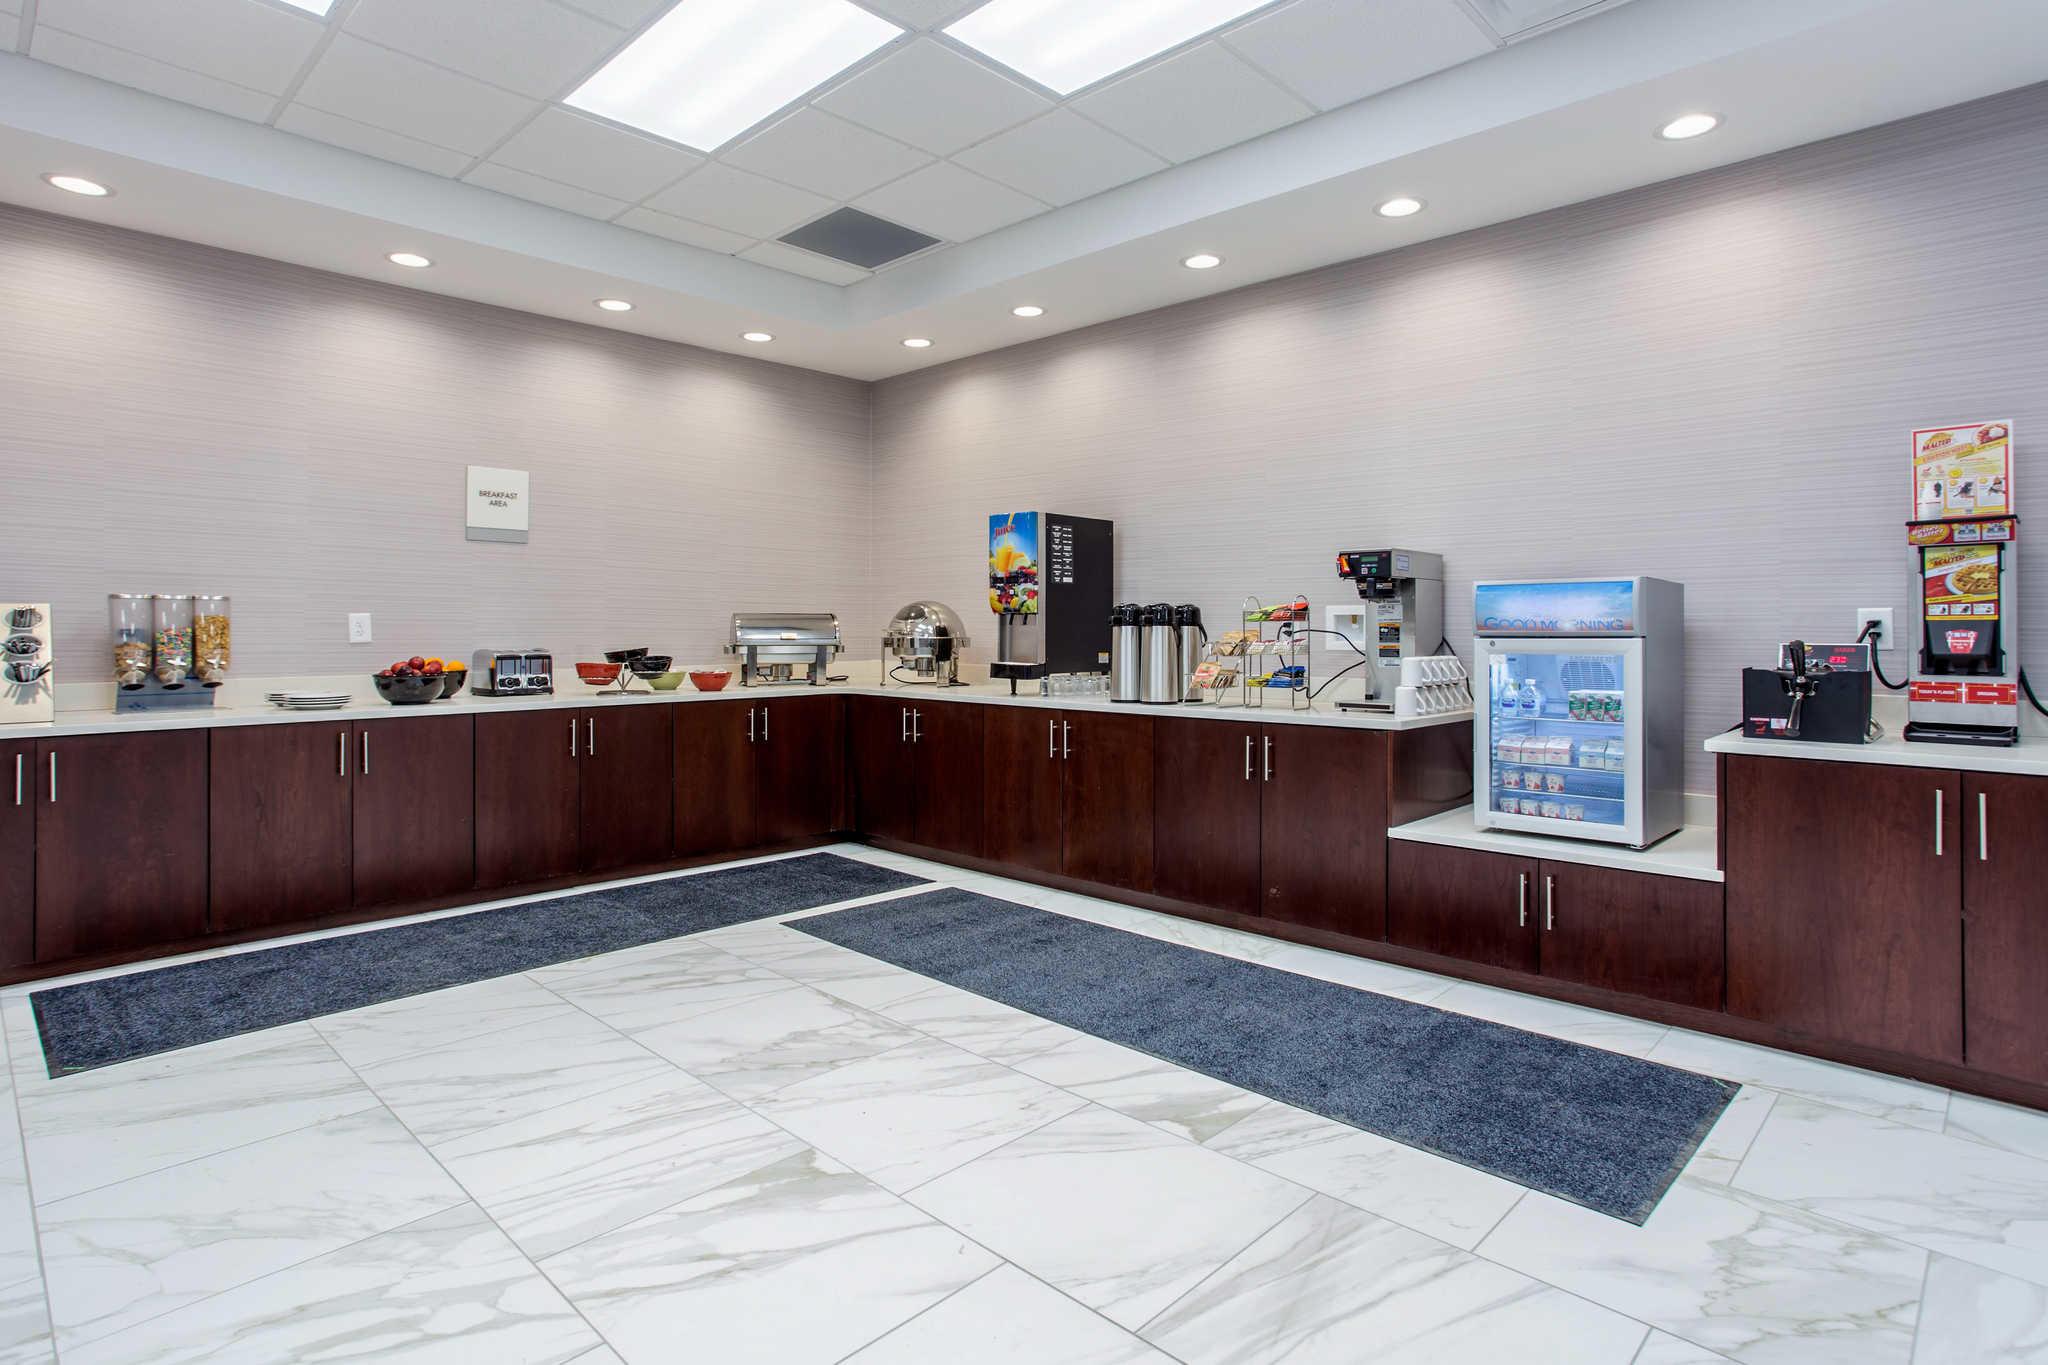 Clarion Inn & Suites image 25